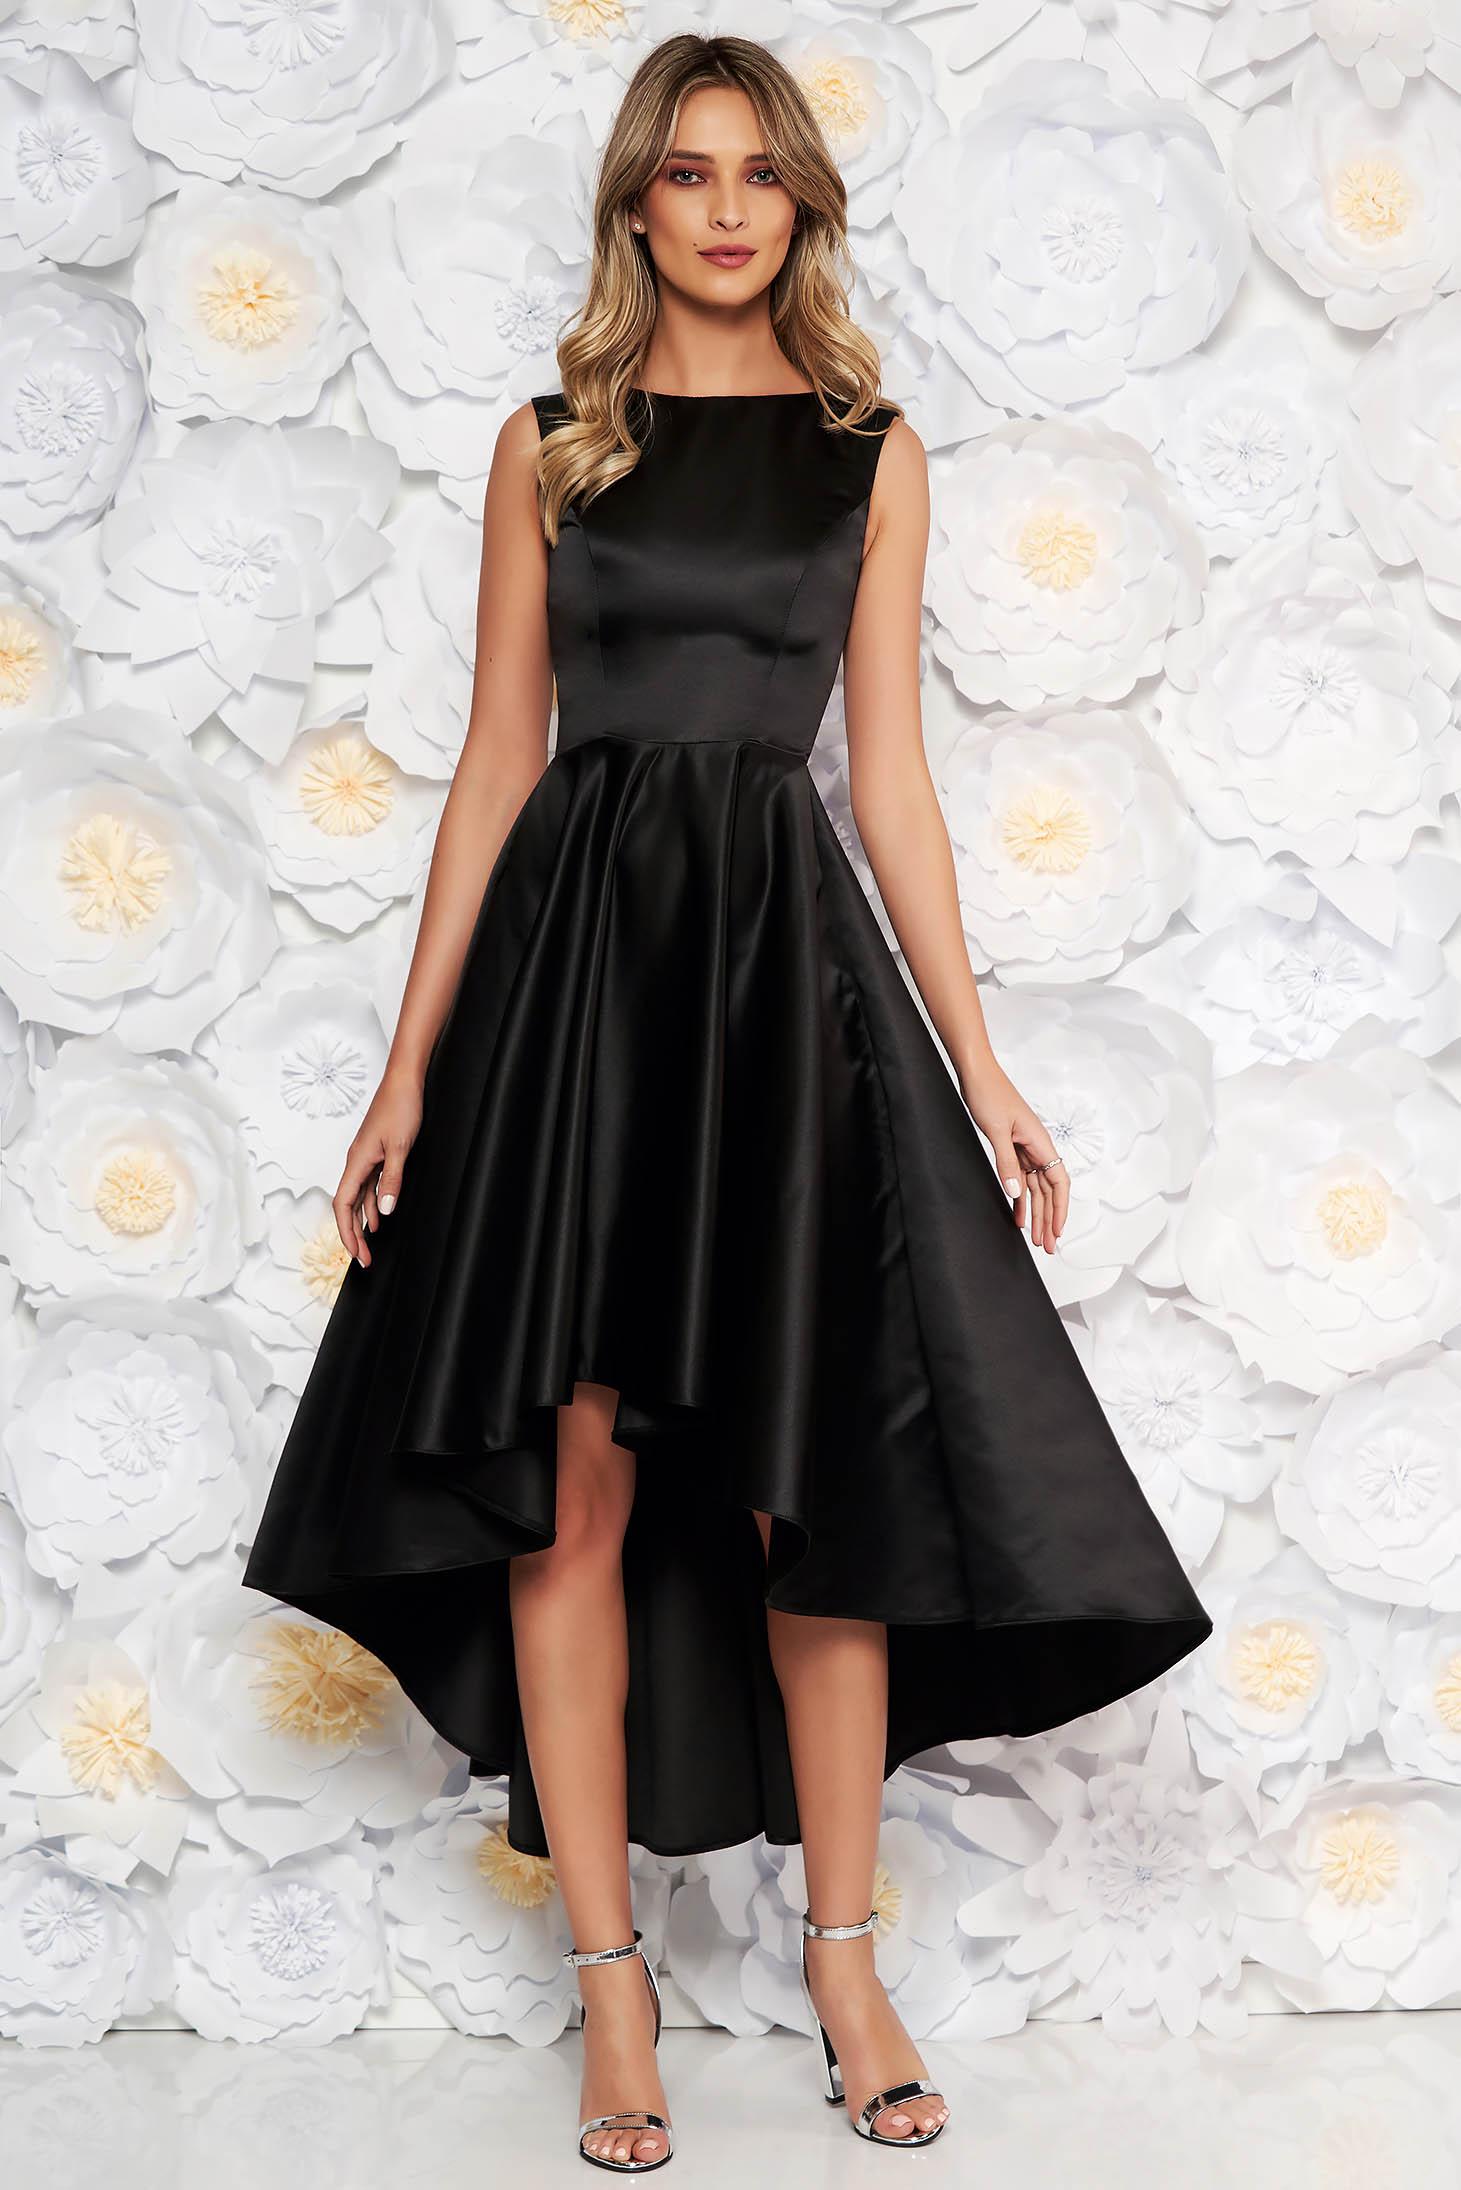 Rochie neagra eleganta de ocazie asimetrica in clos din material satinat fara maneci